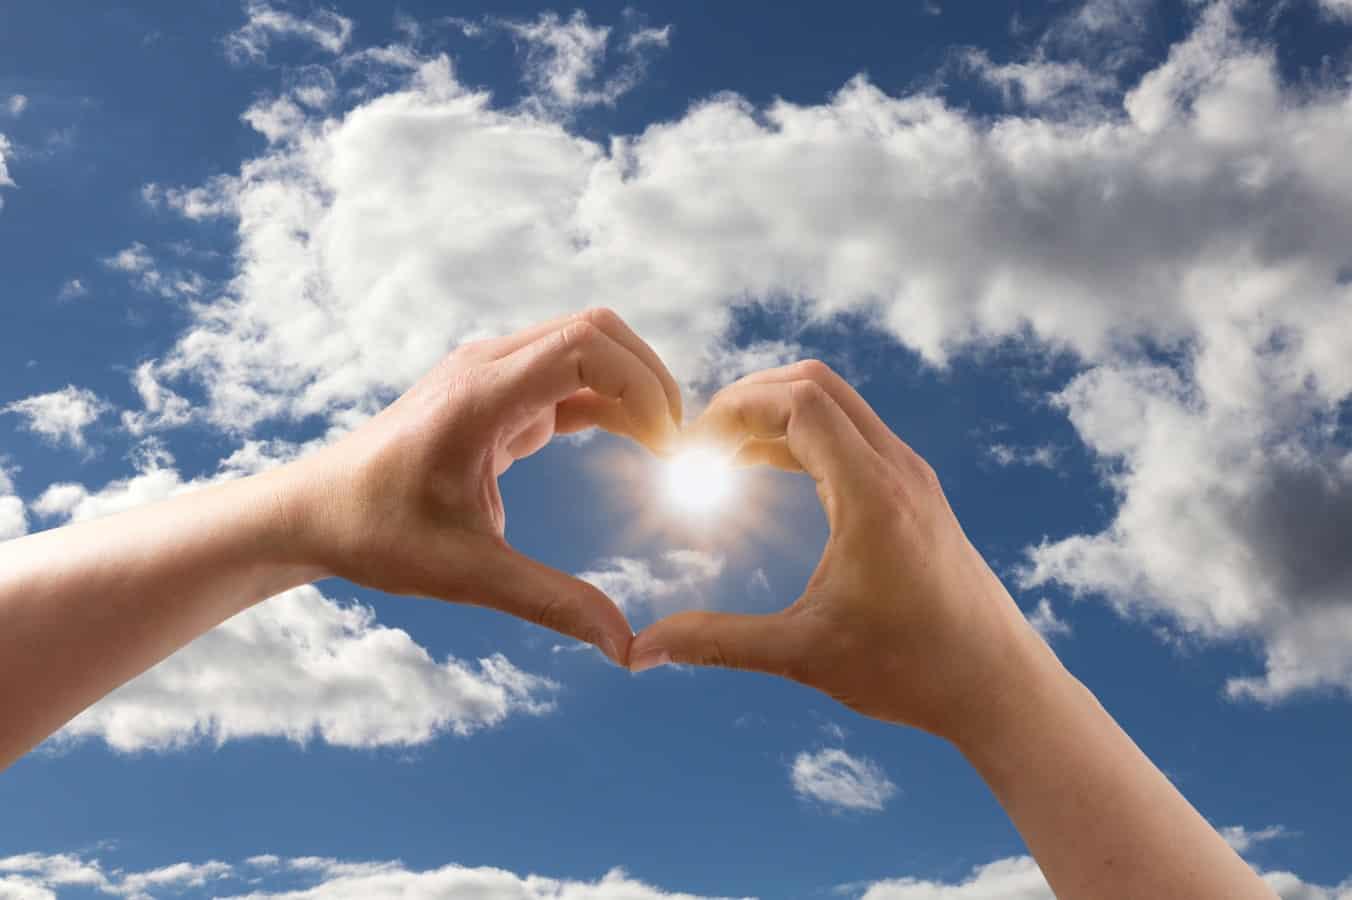 hand light cloud sky sun sunlight 491859 pxhere com 1 236950 2 i236950